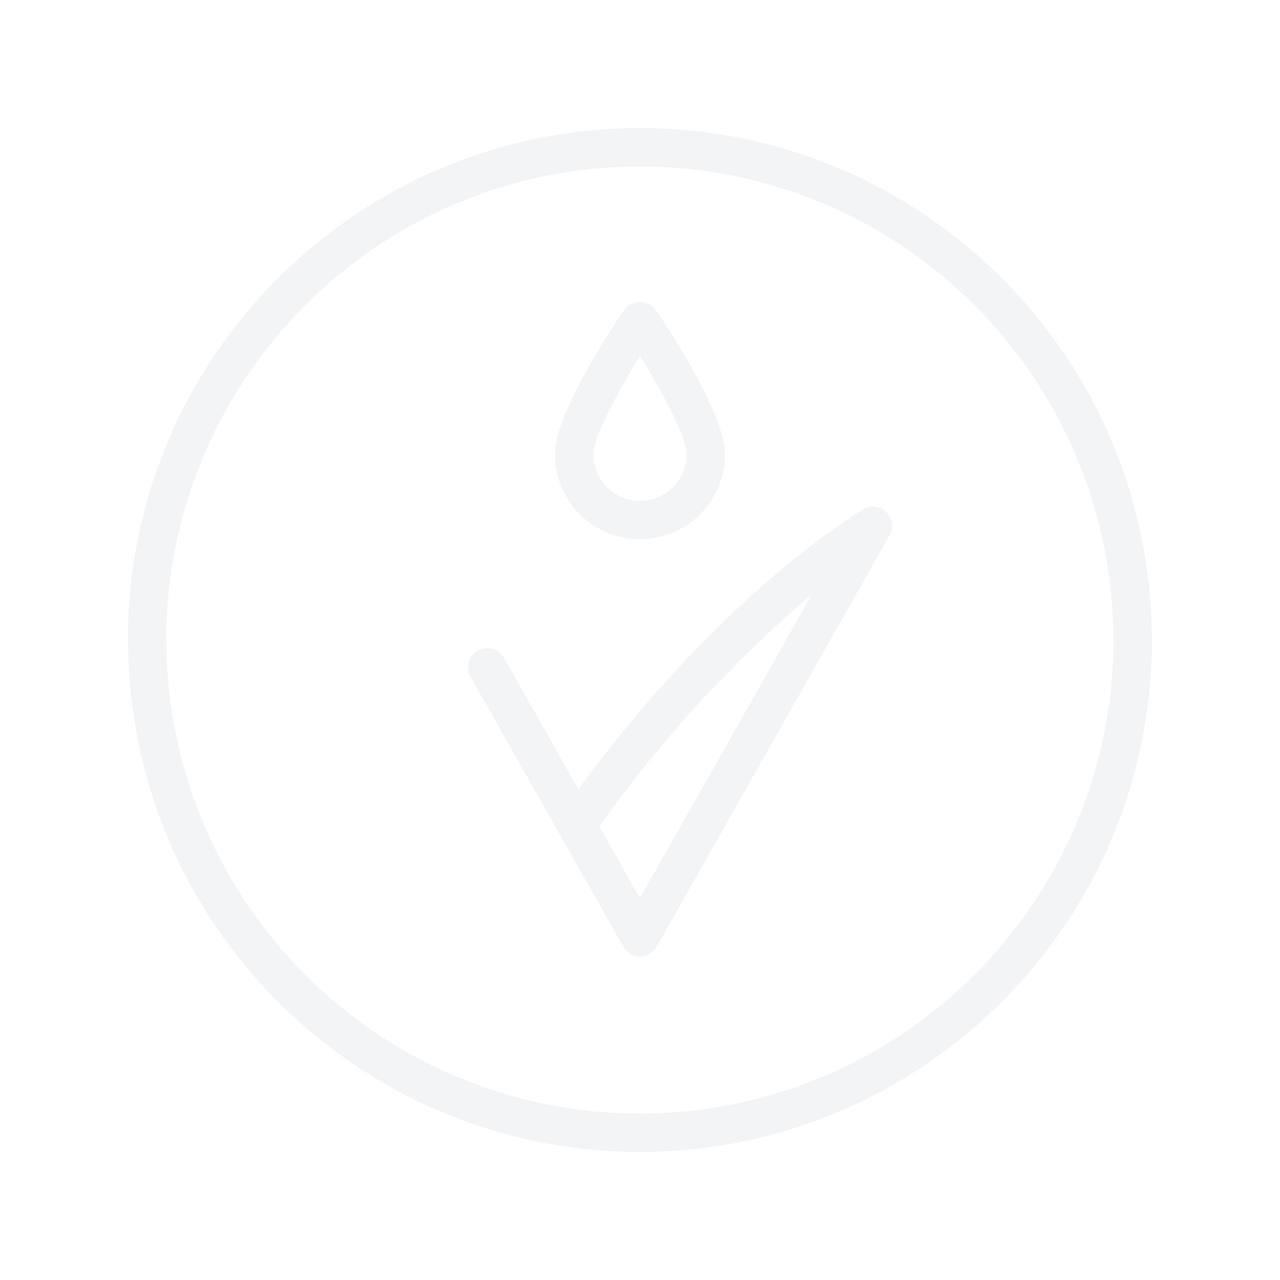 Kérastase Nutritive Masquintense (Dry / Thick Hair) 200ml